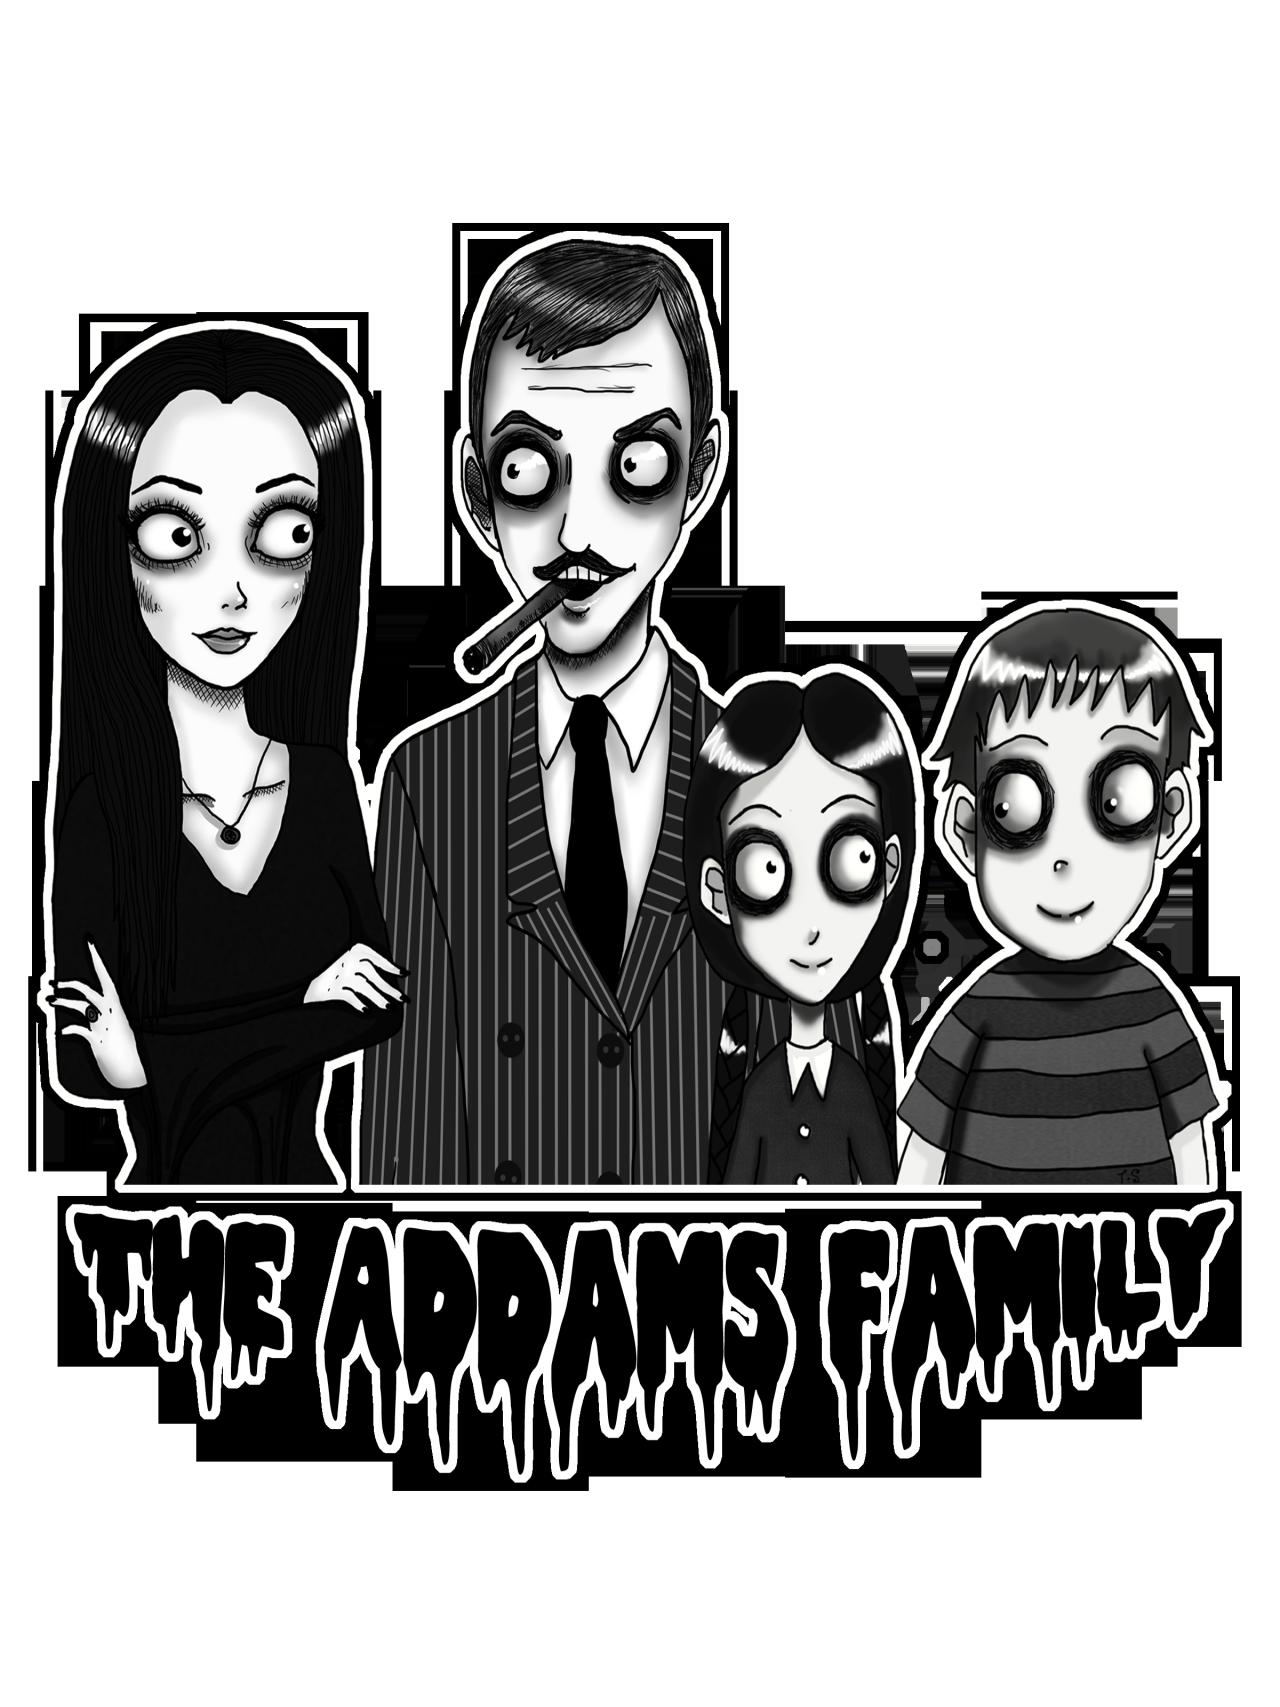 Addams clipart